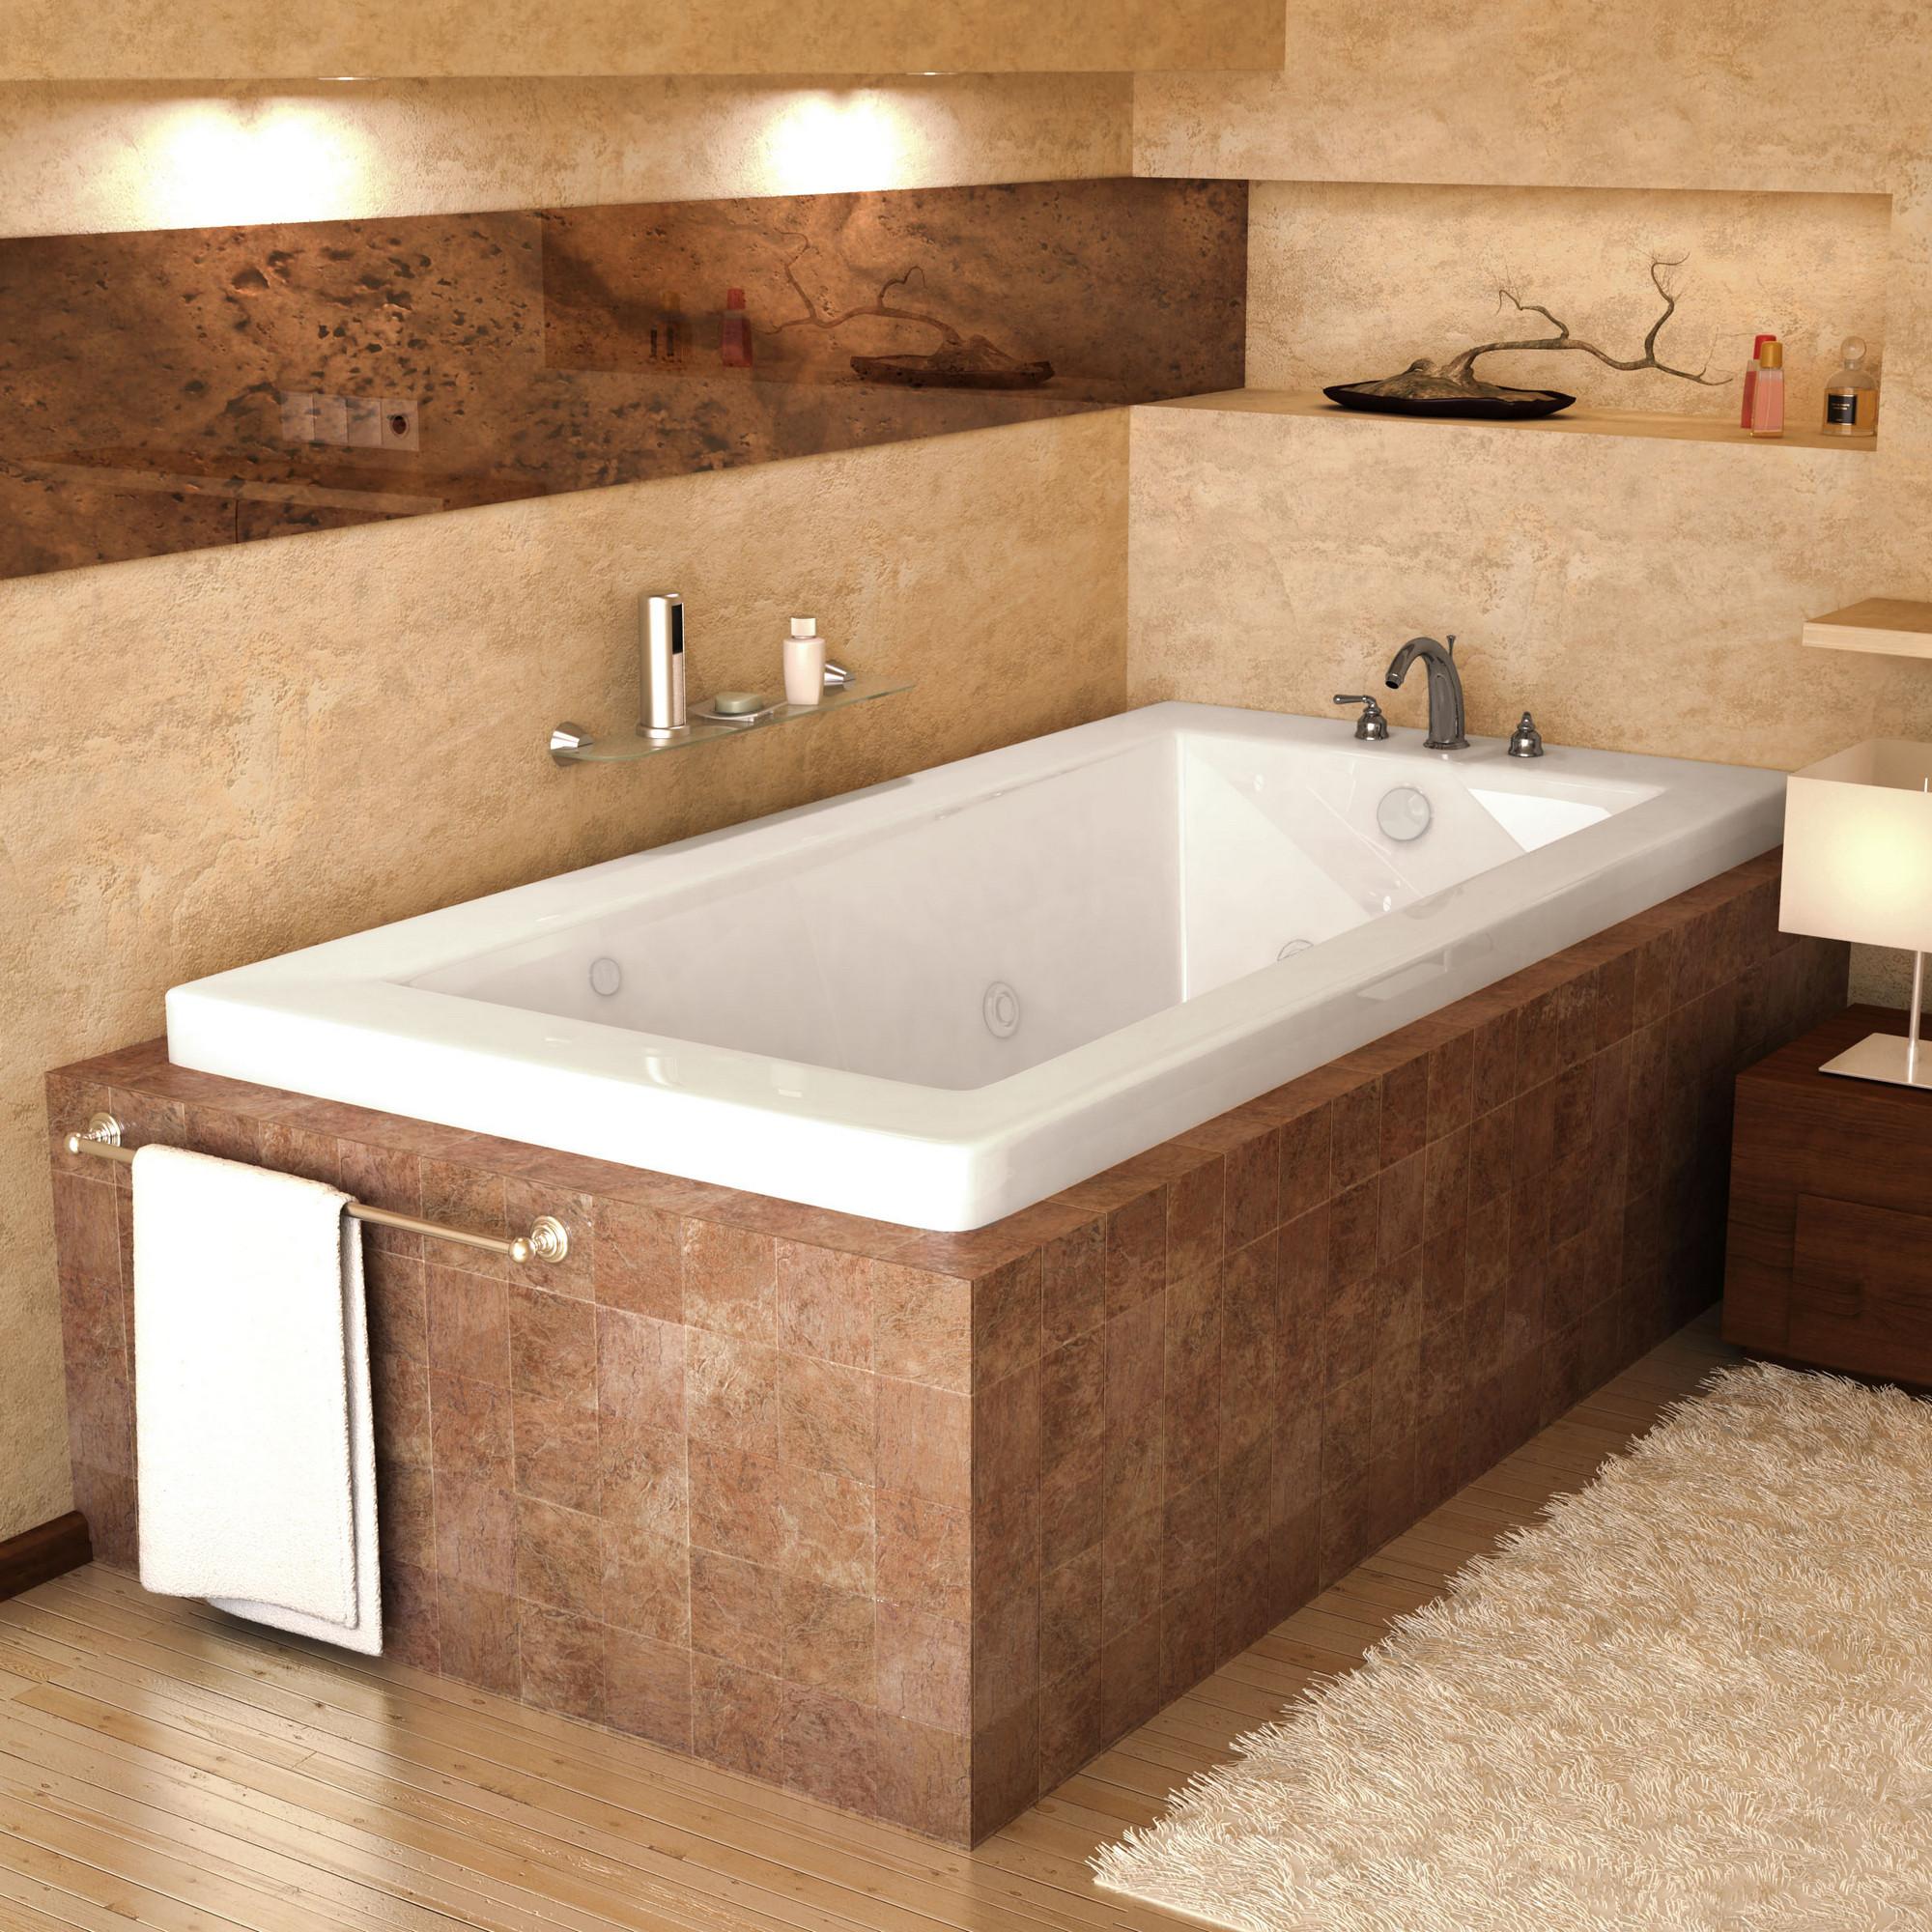 Meditub 3266VNDL Atlantis Venetian Air & Whirlpool Bathtub With Left Drain